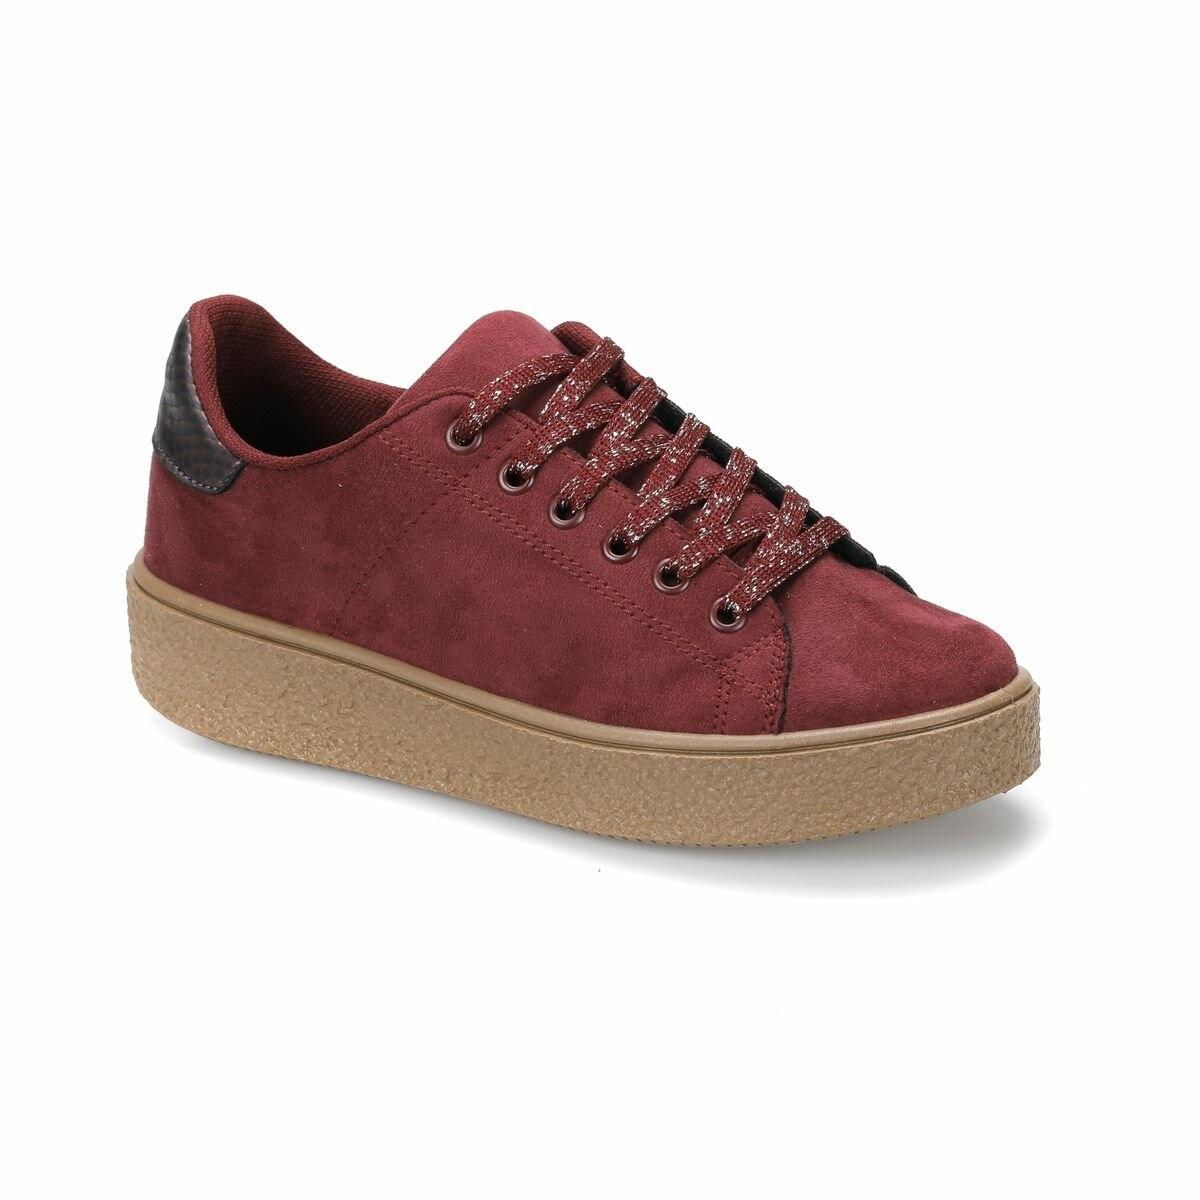 FLO CW18062 Burgundy Women 'S Sneaker Shoes Art Bella